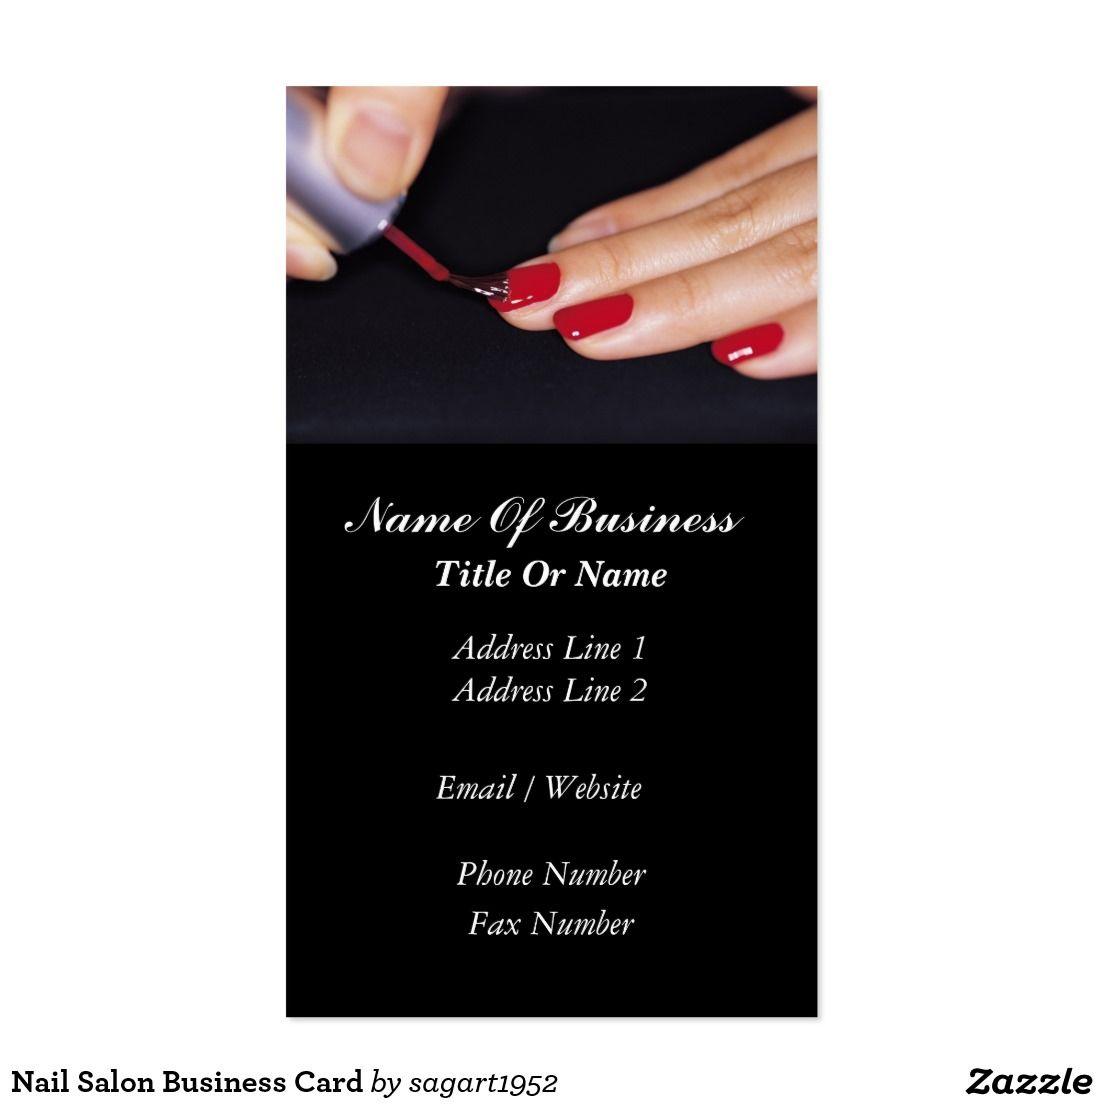 Nail salon business card pinterest nail salons and salons nail salon business card reheart Image collections